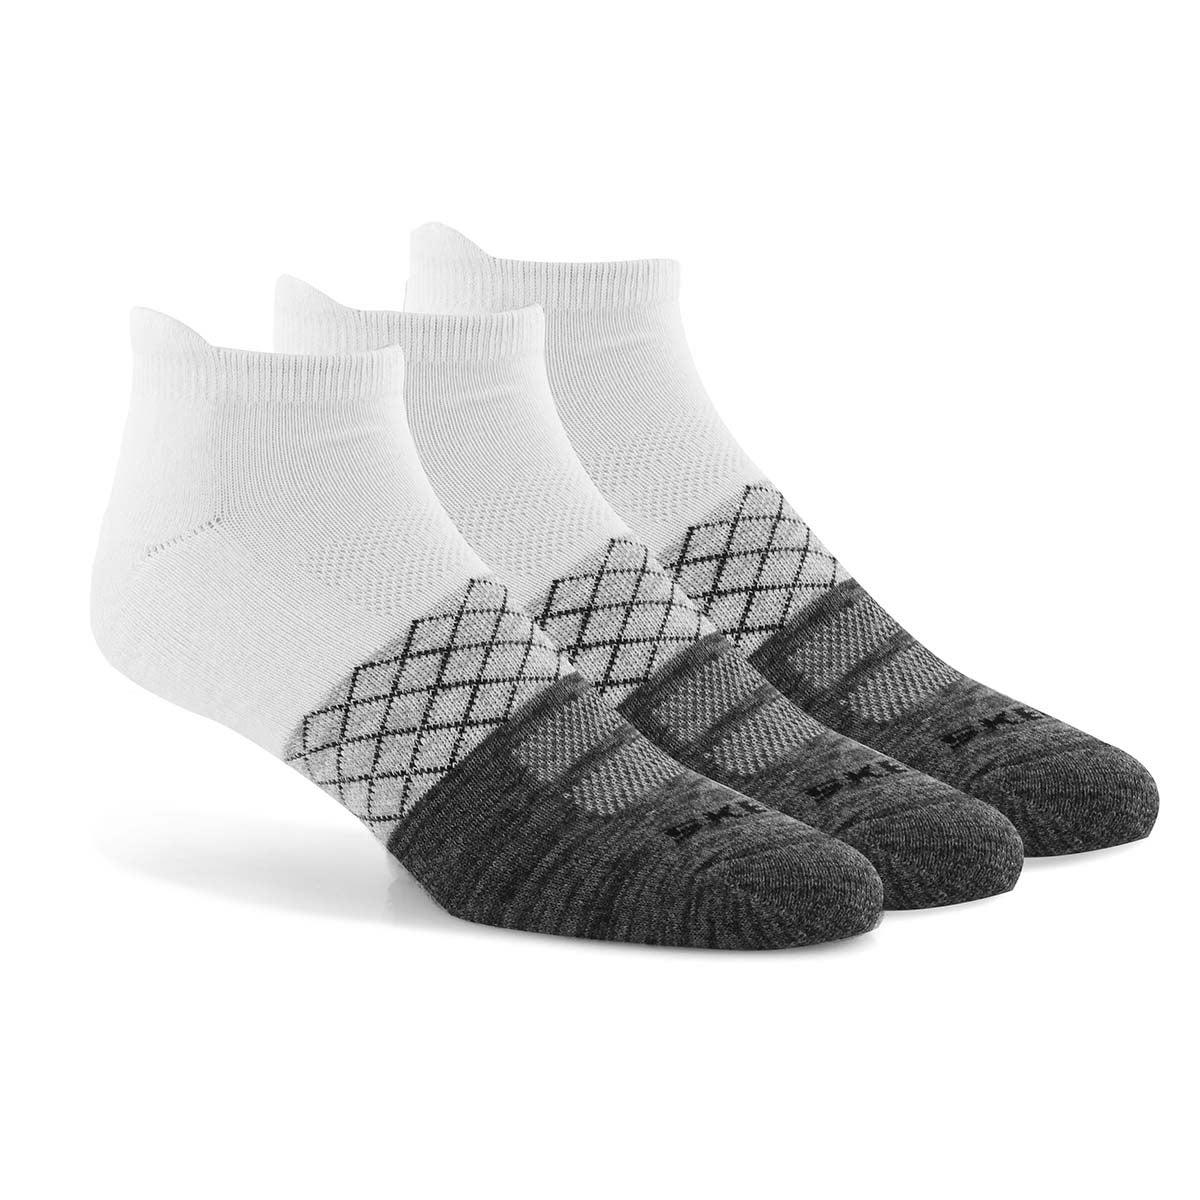 Men's LOW CUT HALF TERRY wht/ gry socks - 3 pk